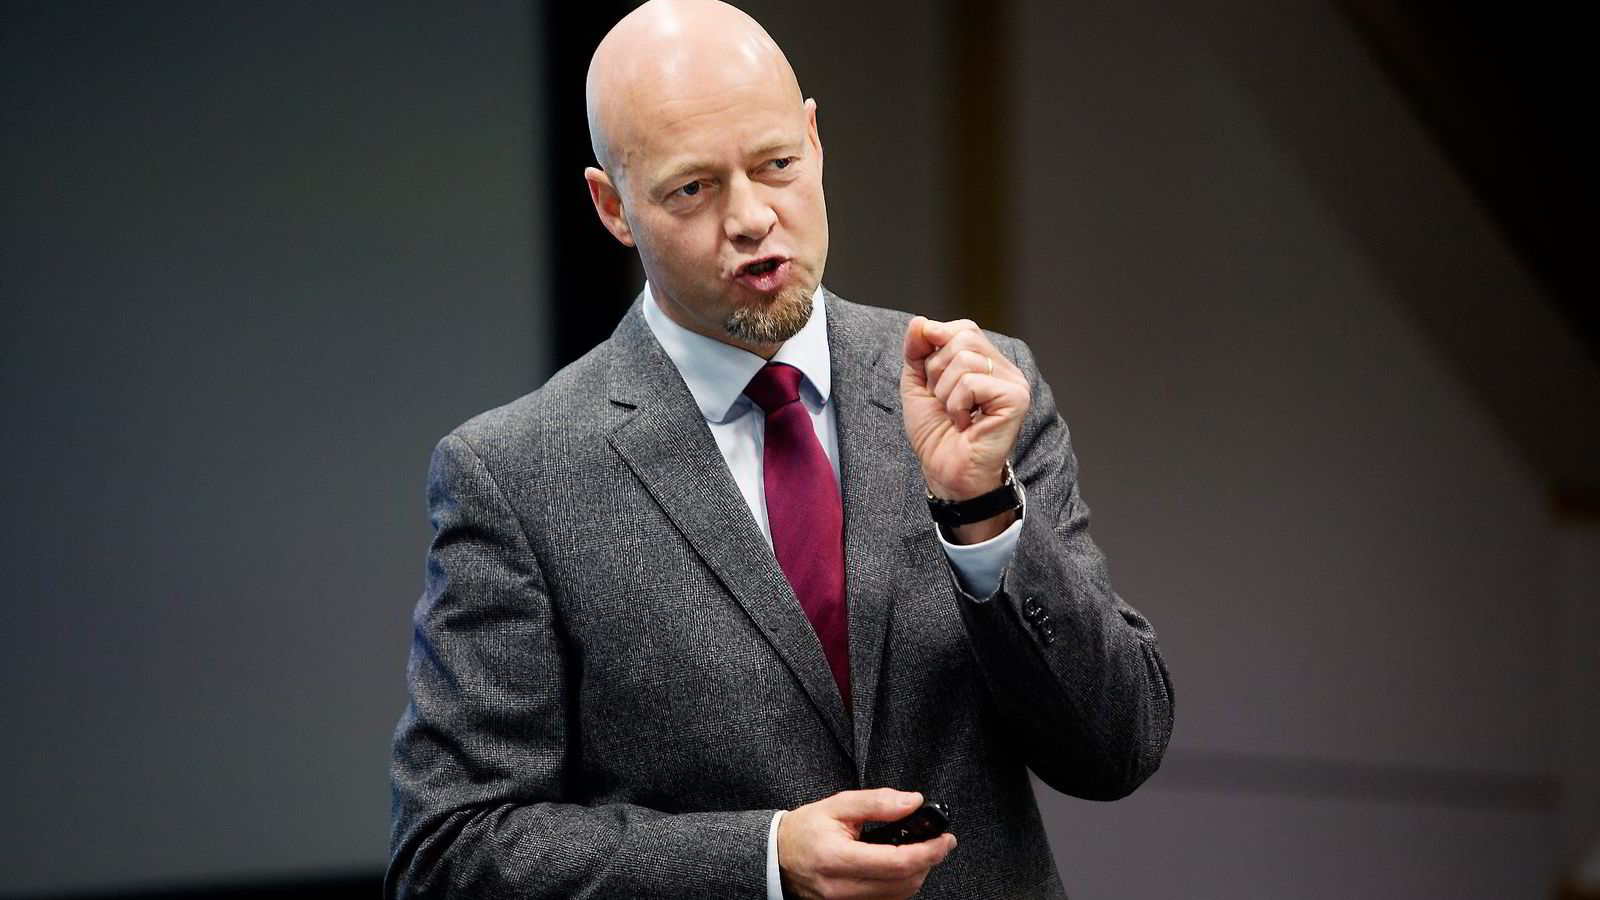 Oljefondets Yngve Slyngstad øker risikoen.                Foto: